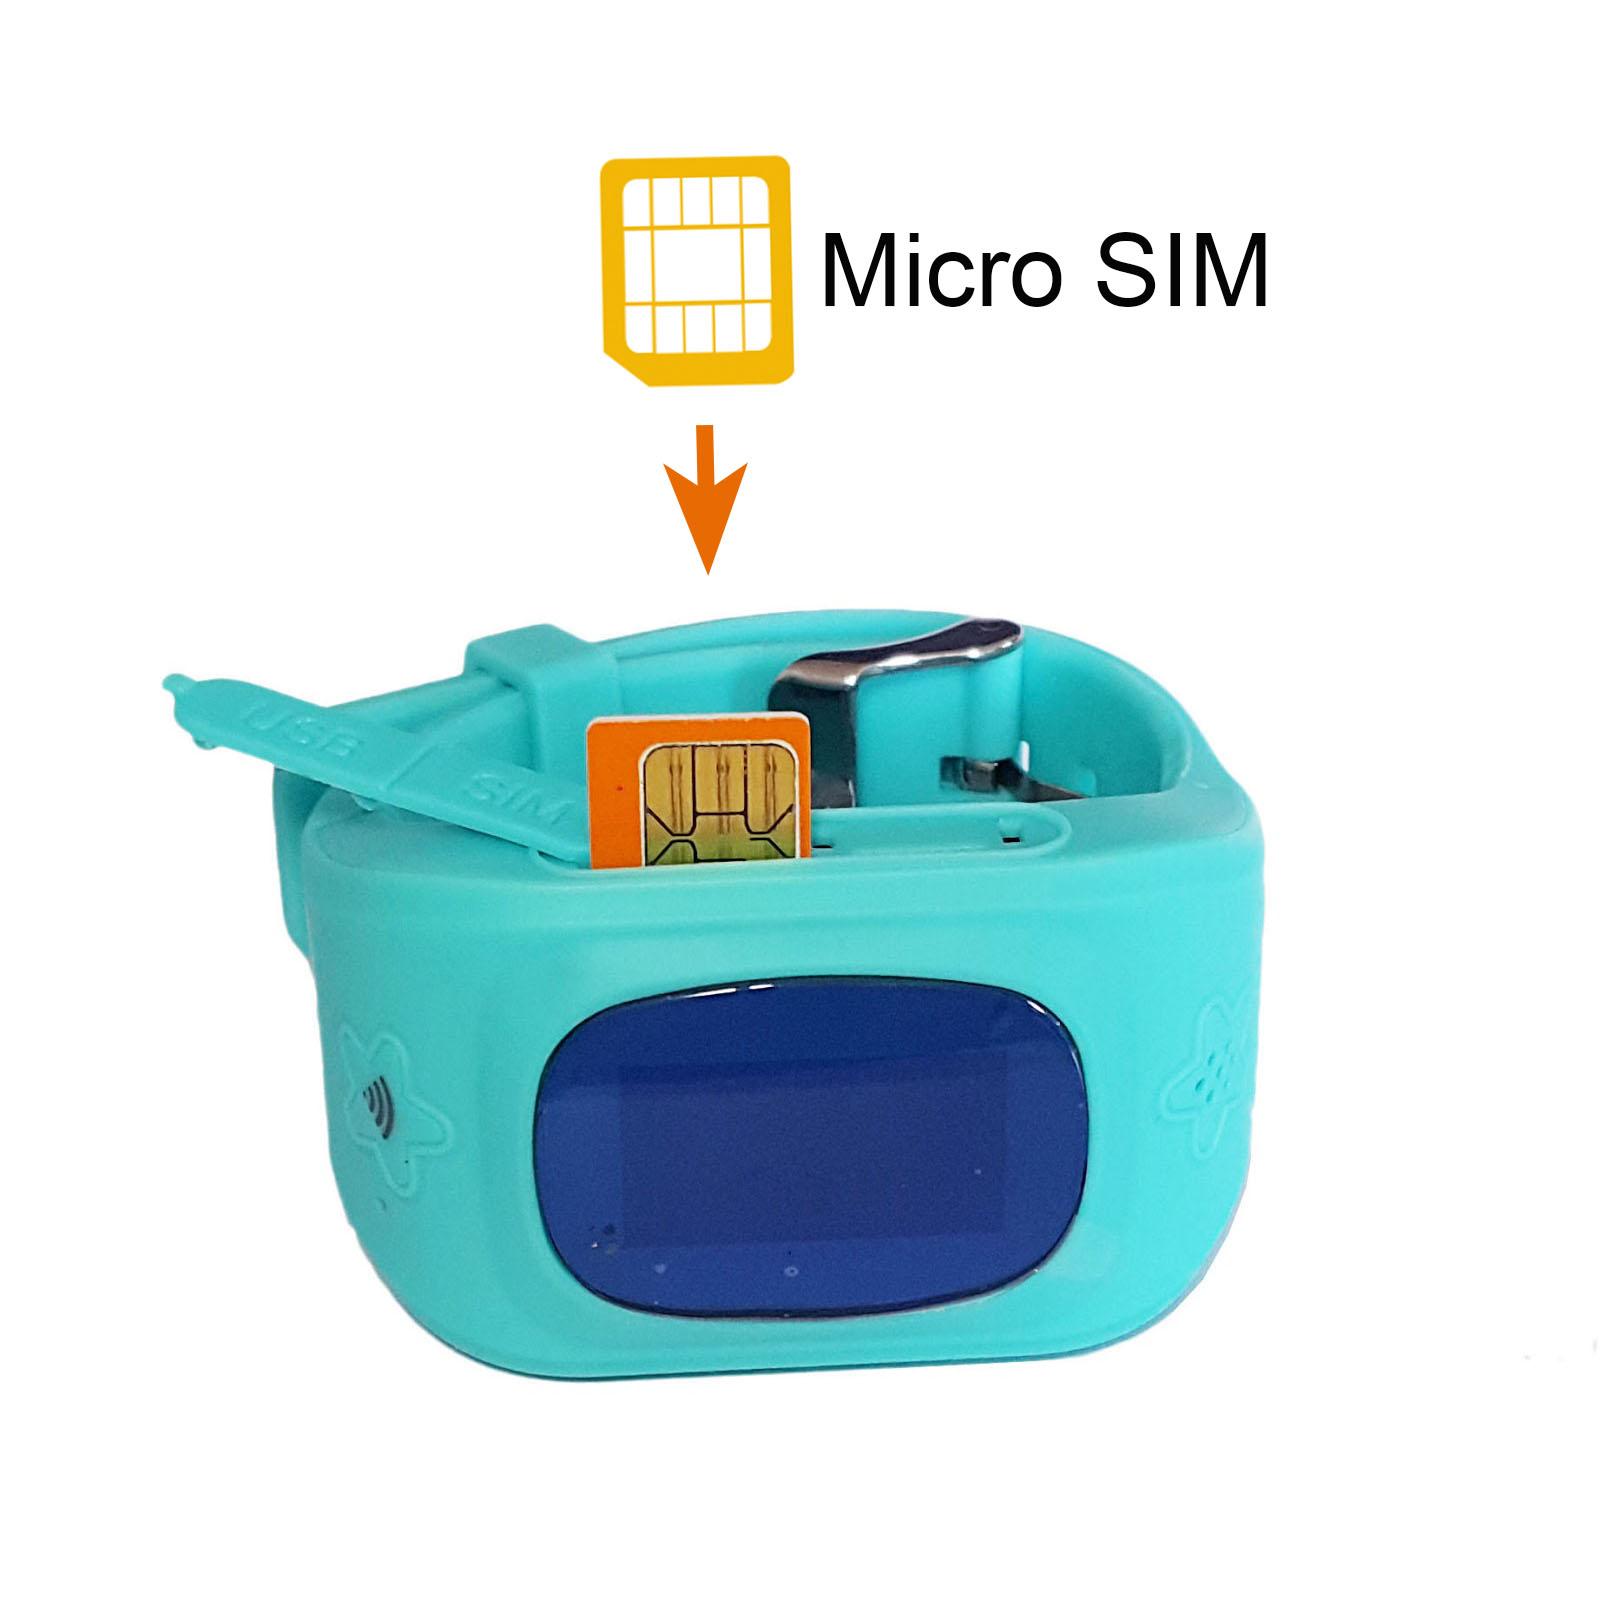 Y3 Micro SIM copy1.jpg